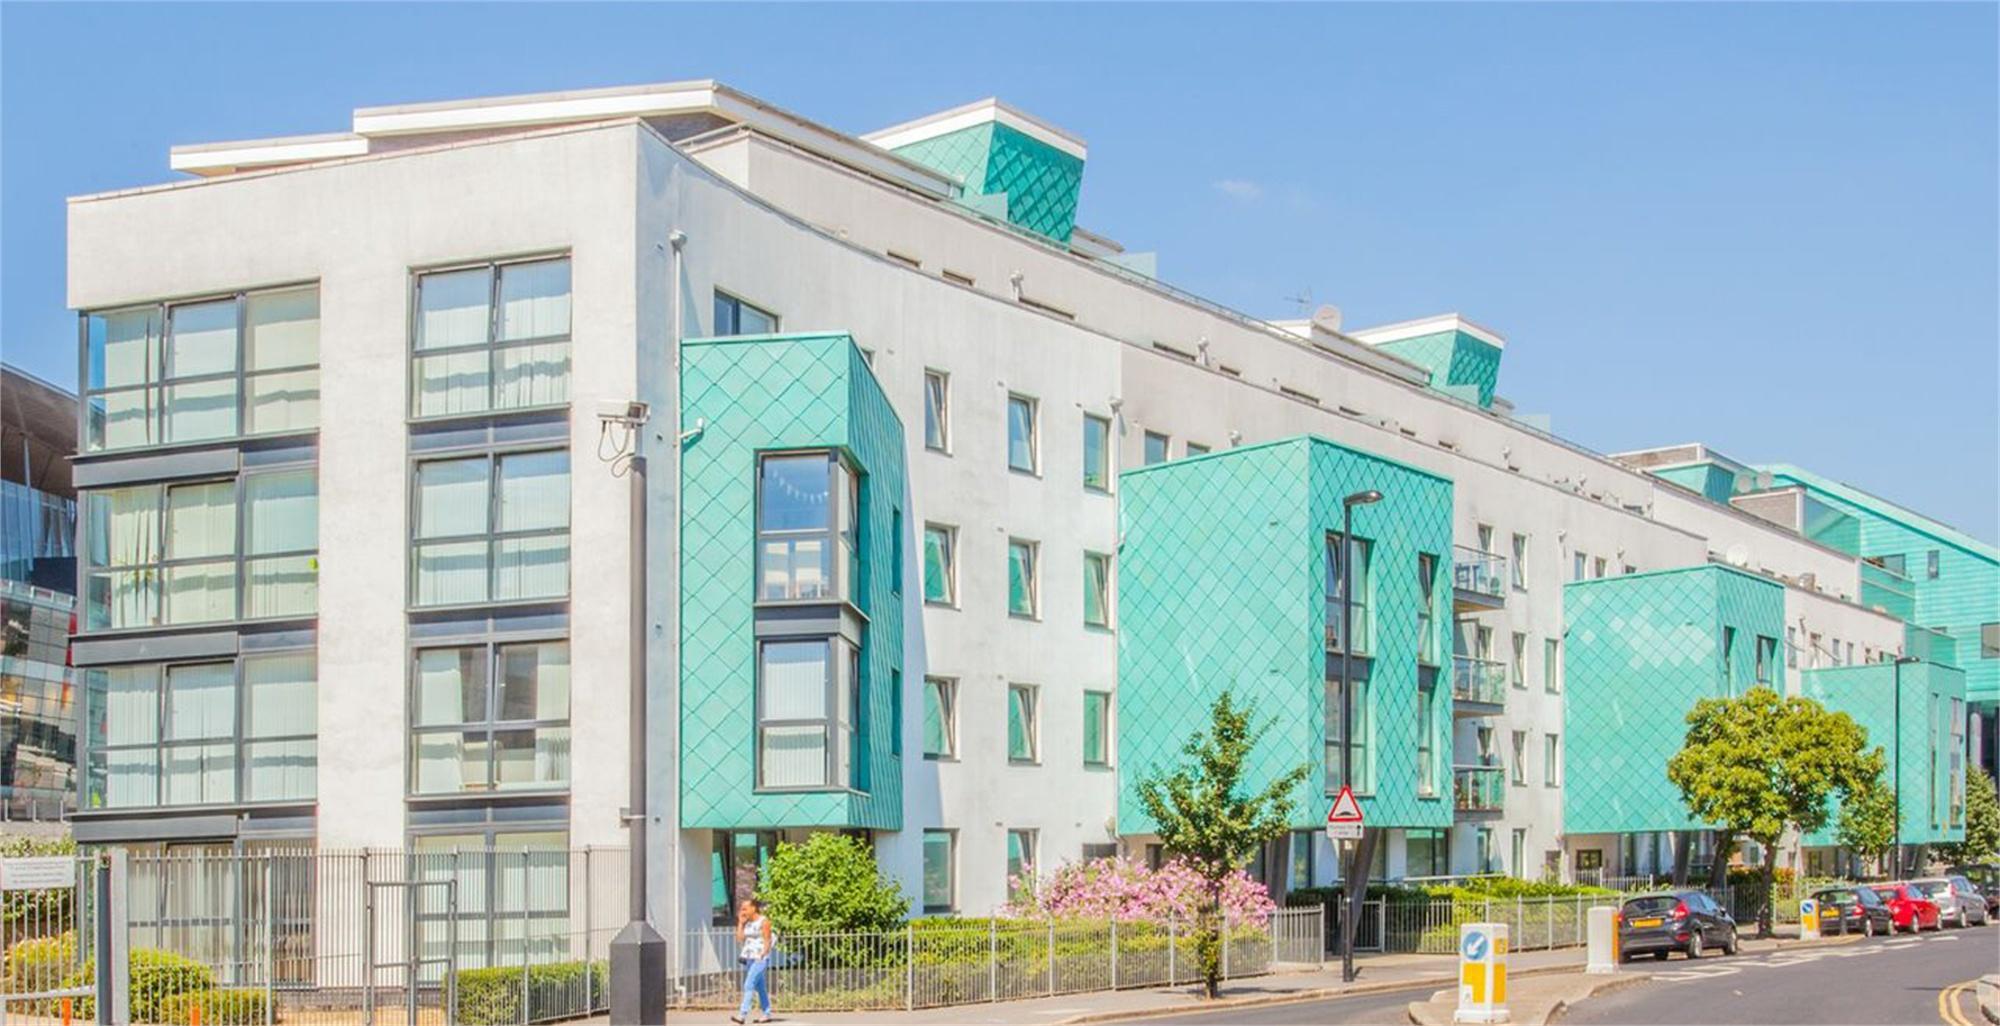 The Drayton Park Apartments